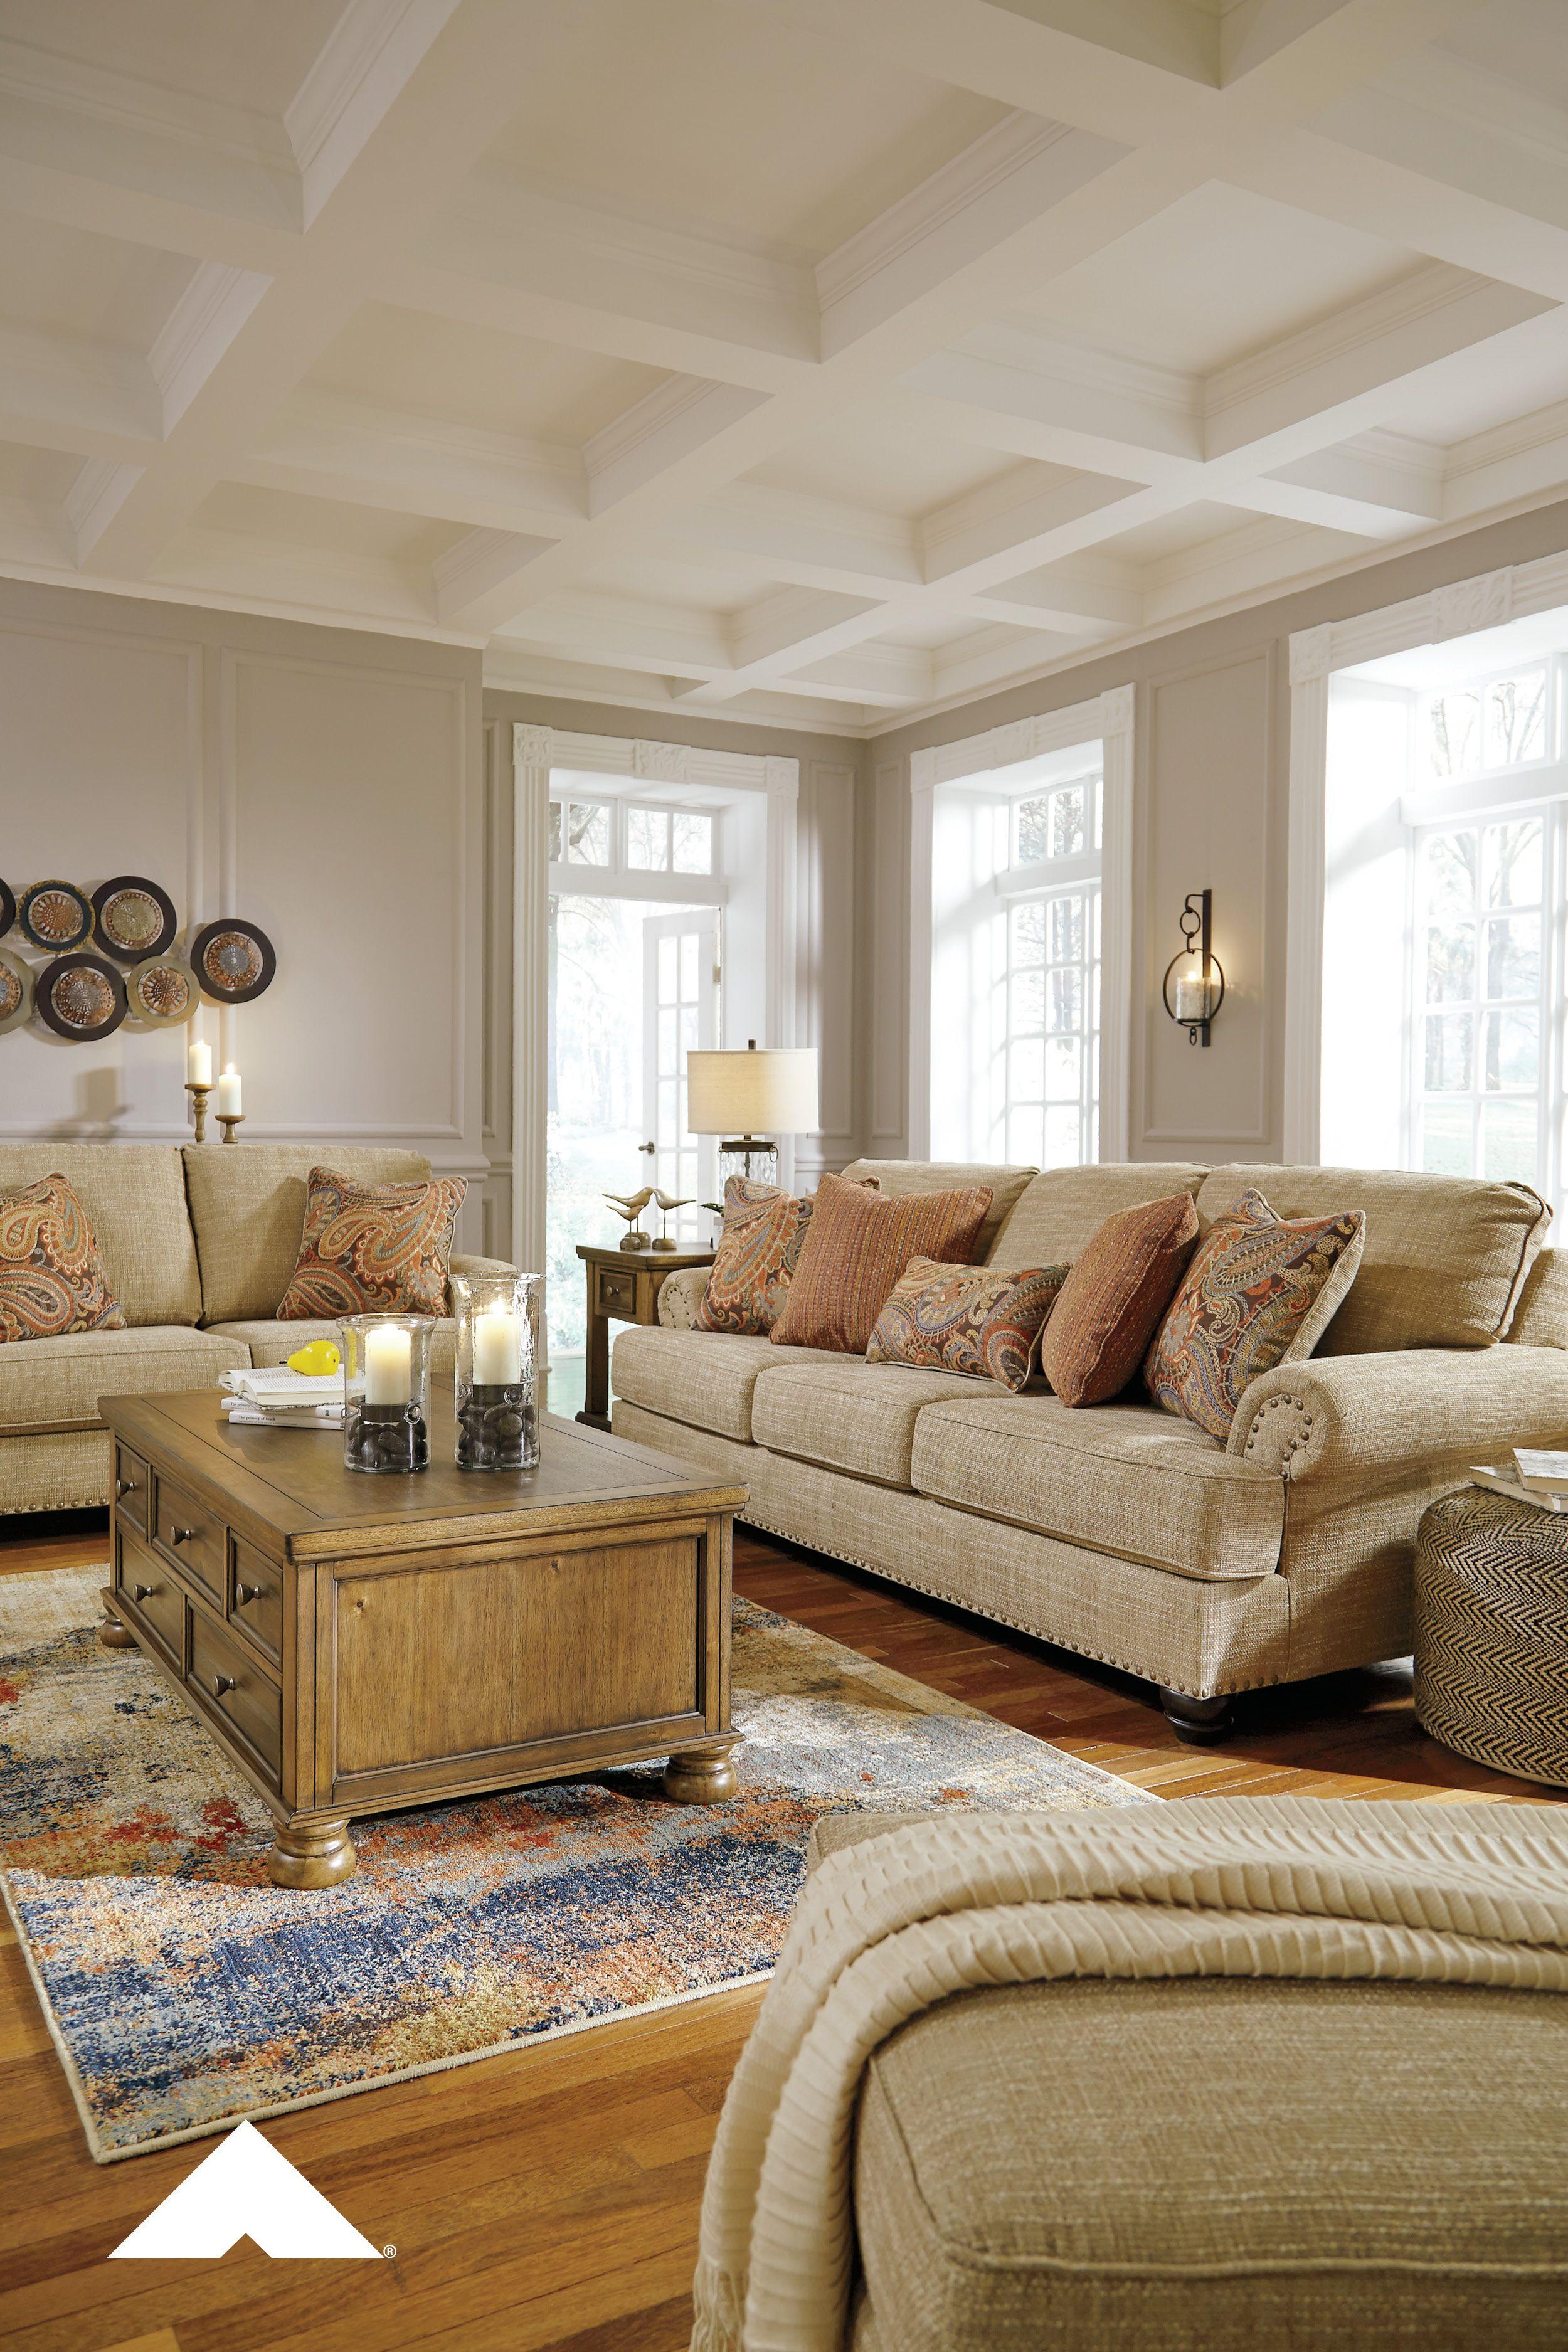 Candoro Oatmeal Living Room By Ashley Furniture Livingroomdecor Sofa Homeideas Livingroomid Ashley Furniture Living Room Furniture Blue Sofas Living Room